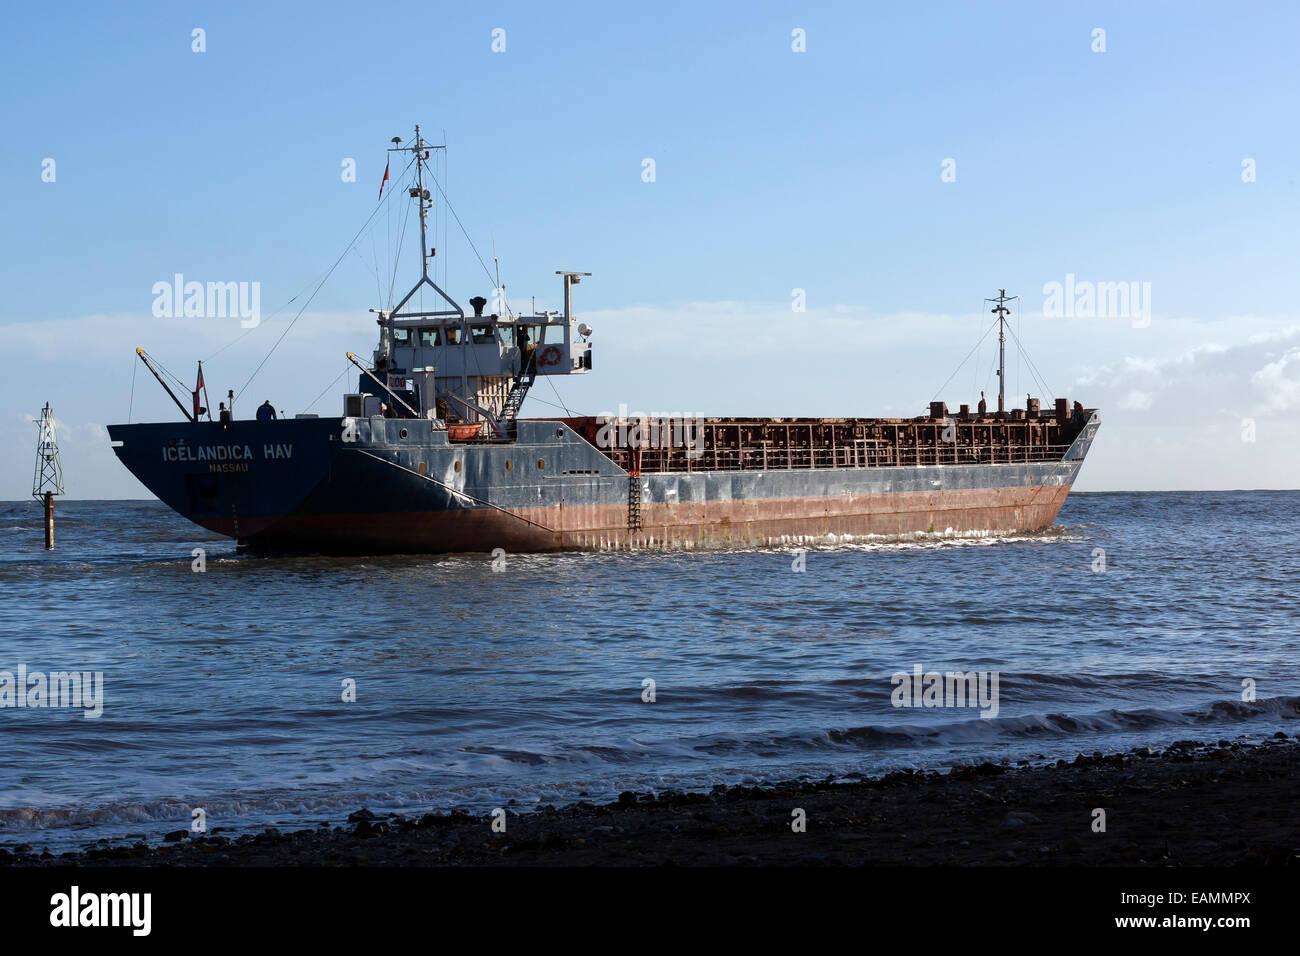 container ship icelandica hav leaving Teignmouth,Devon,Shaldon IMO: 8128884 MMSI: 309175000 Call Sign: C6VC3 Flag: Stock Photo